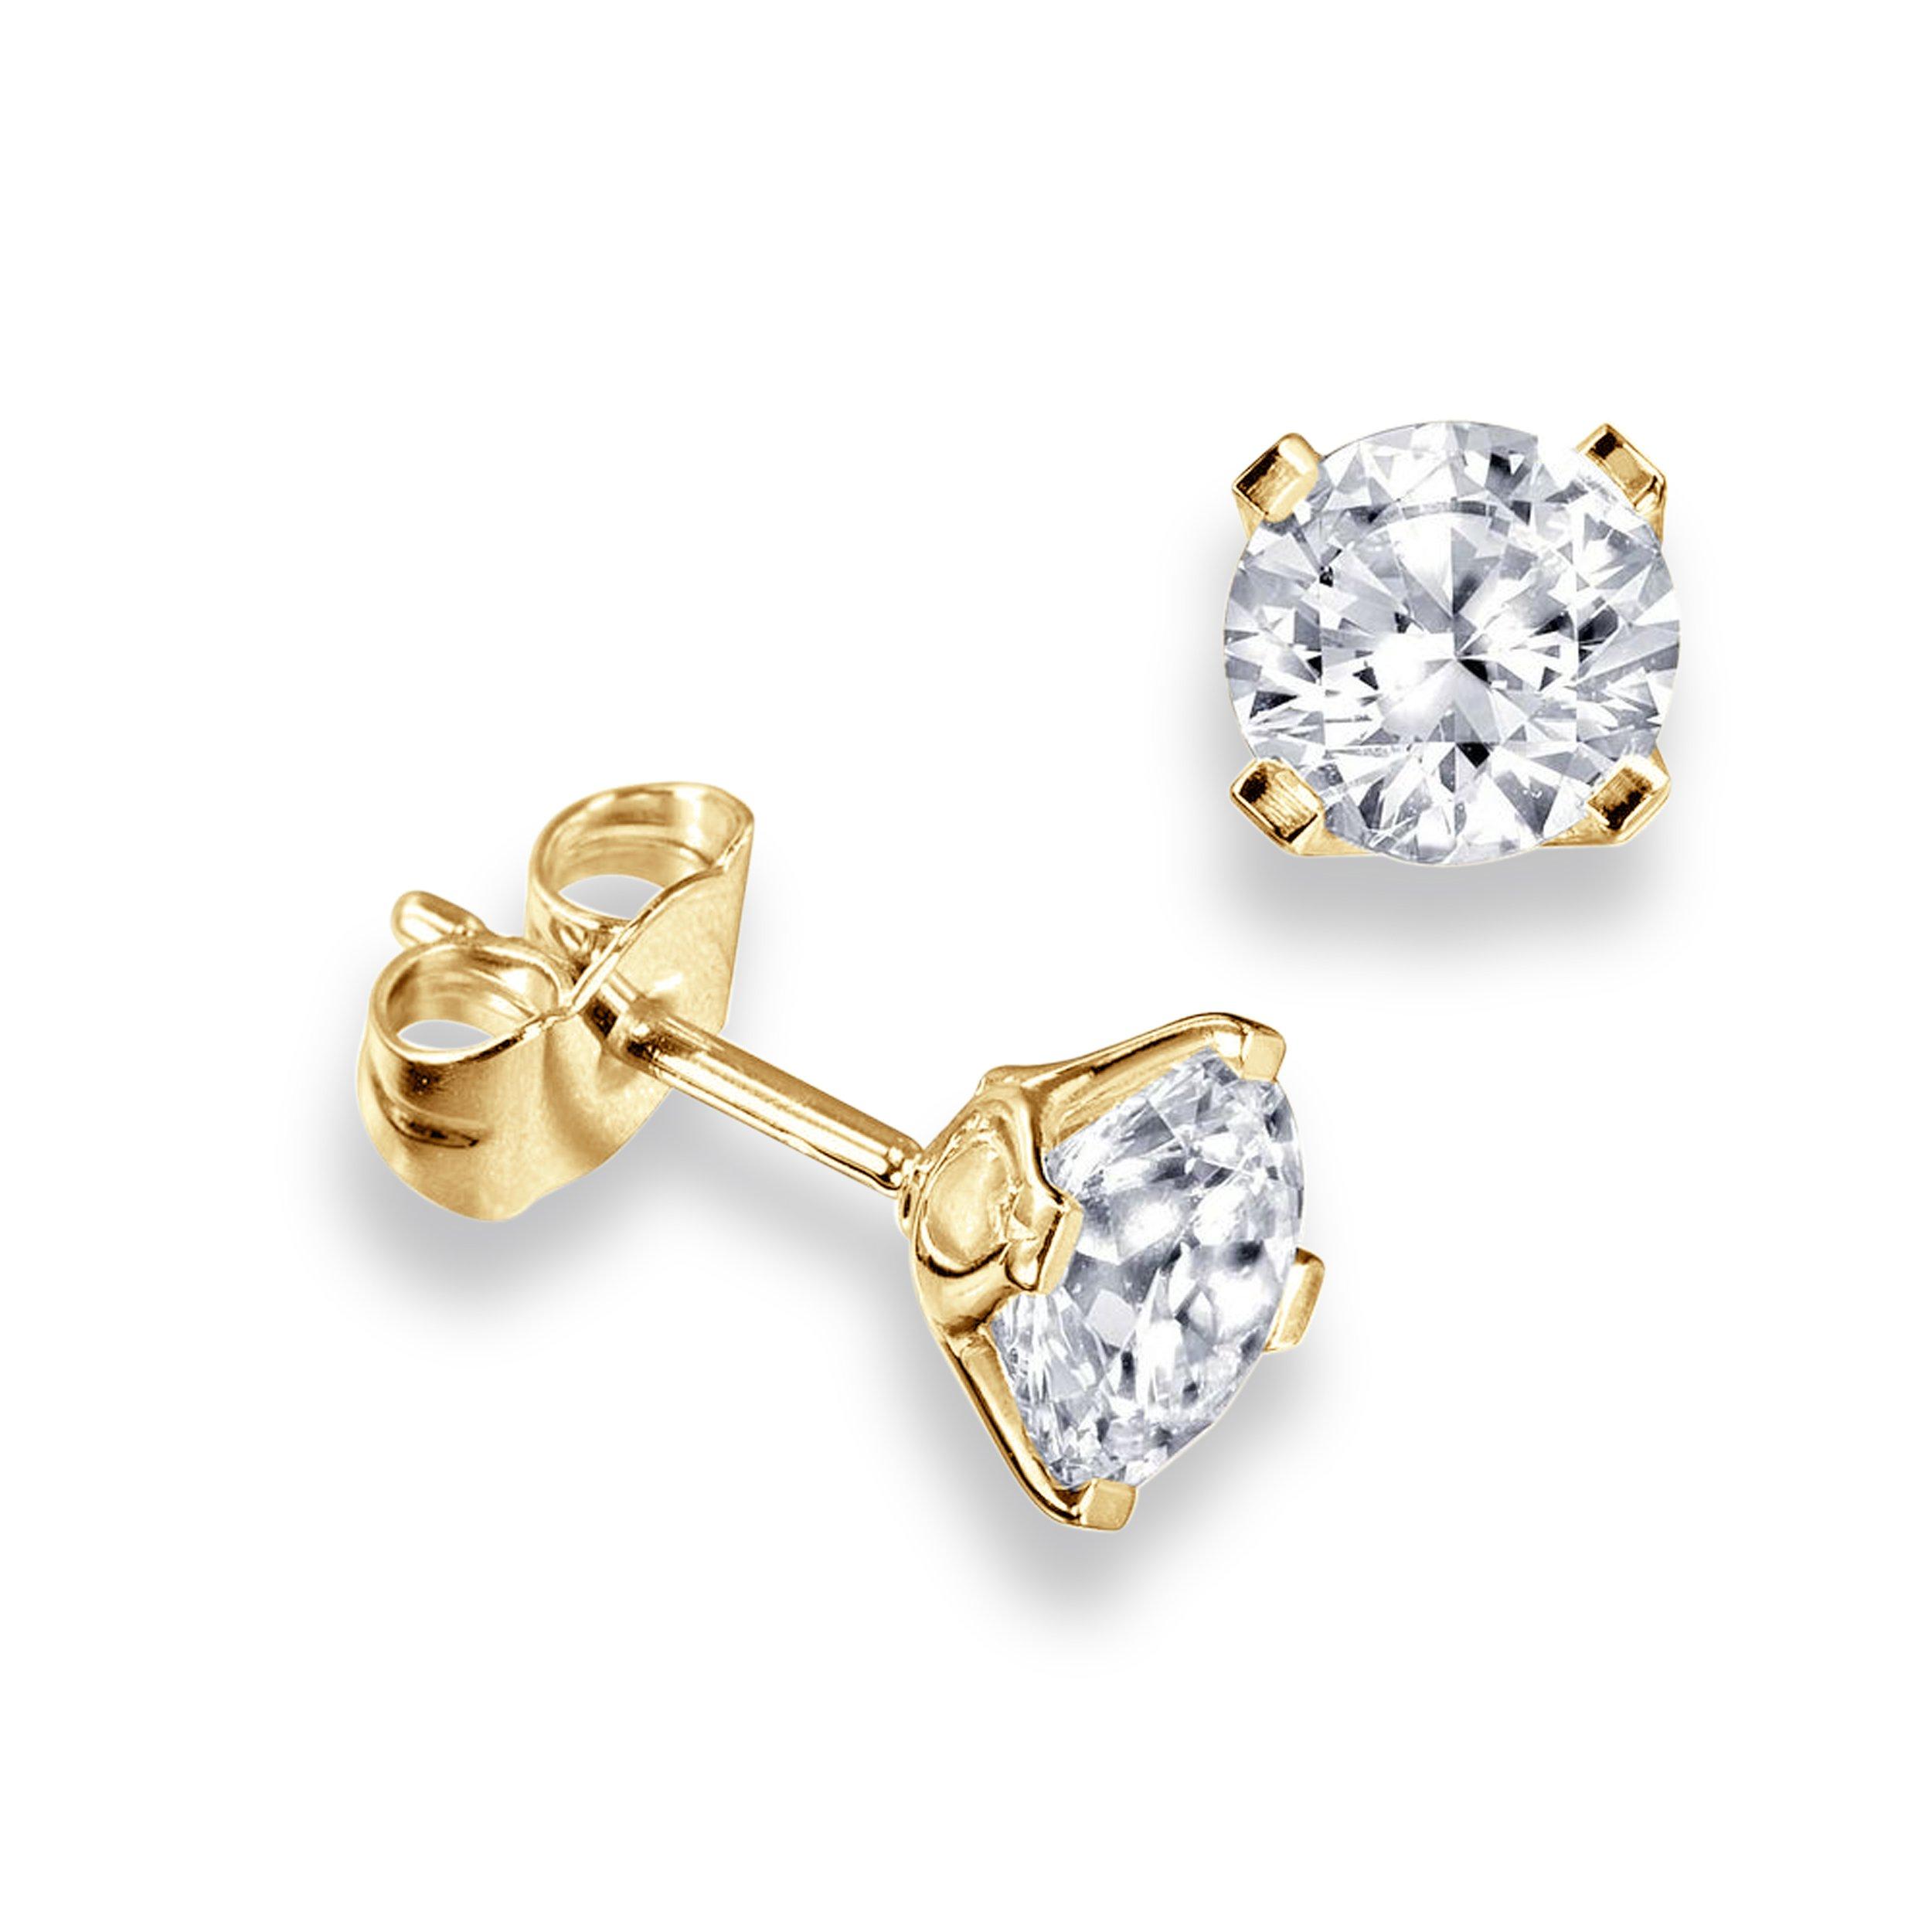 70fdde6653c2a2 Platinum, 18ct & 9ct Gold Single Diamond Stud Earrings For Men